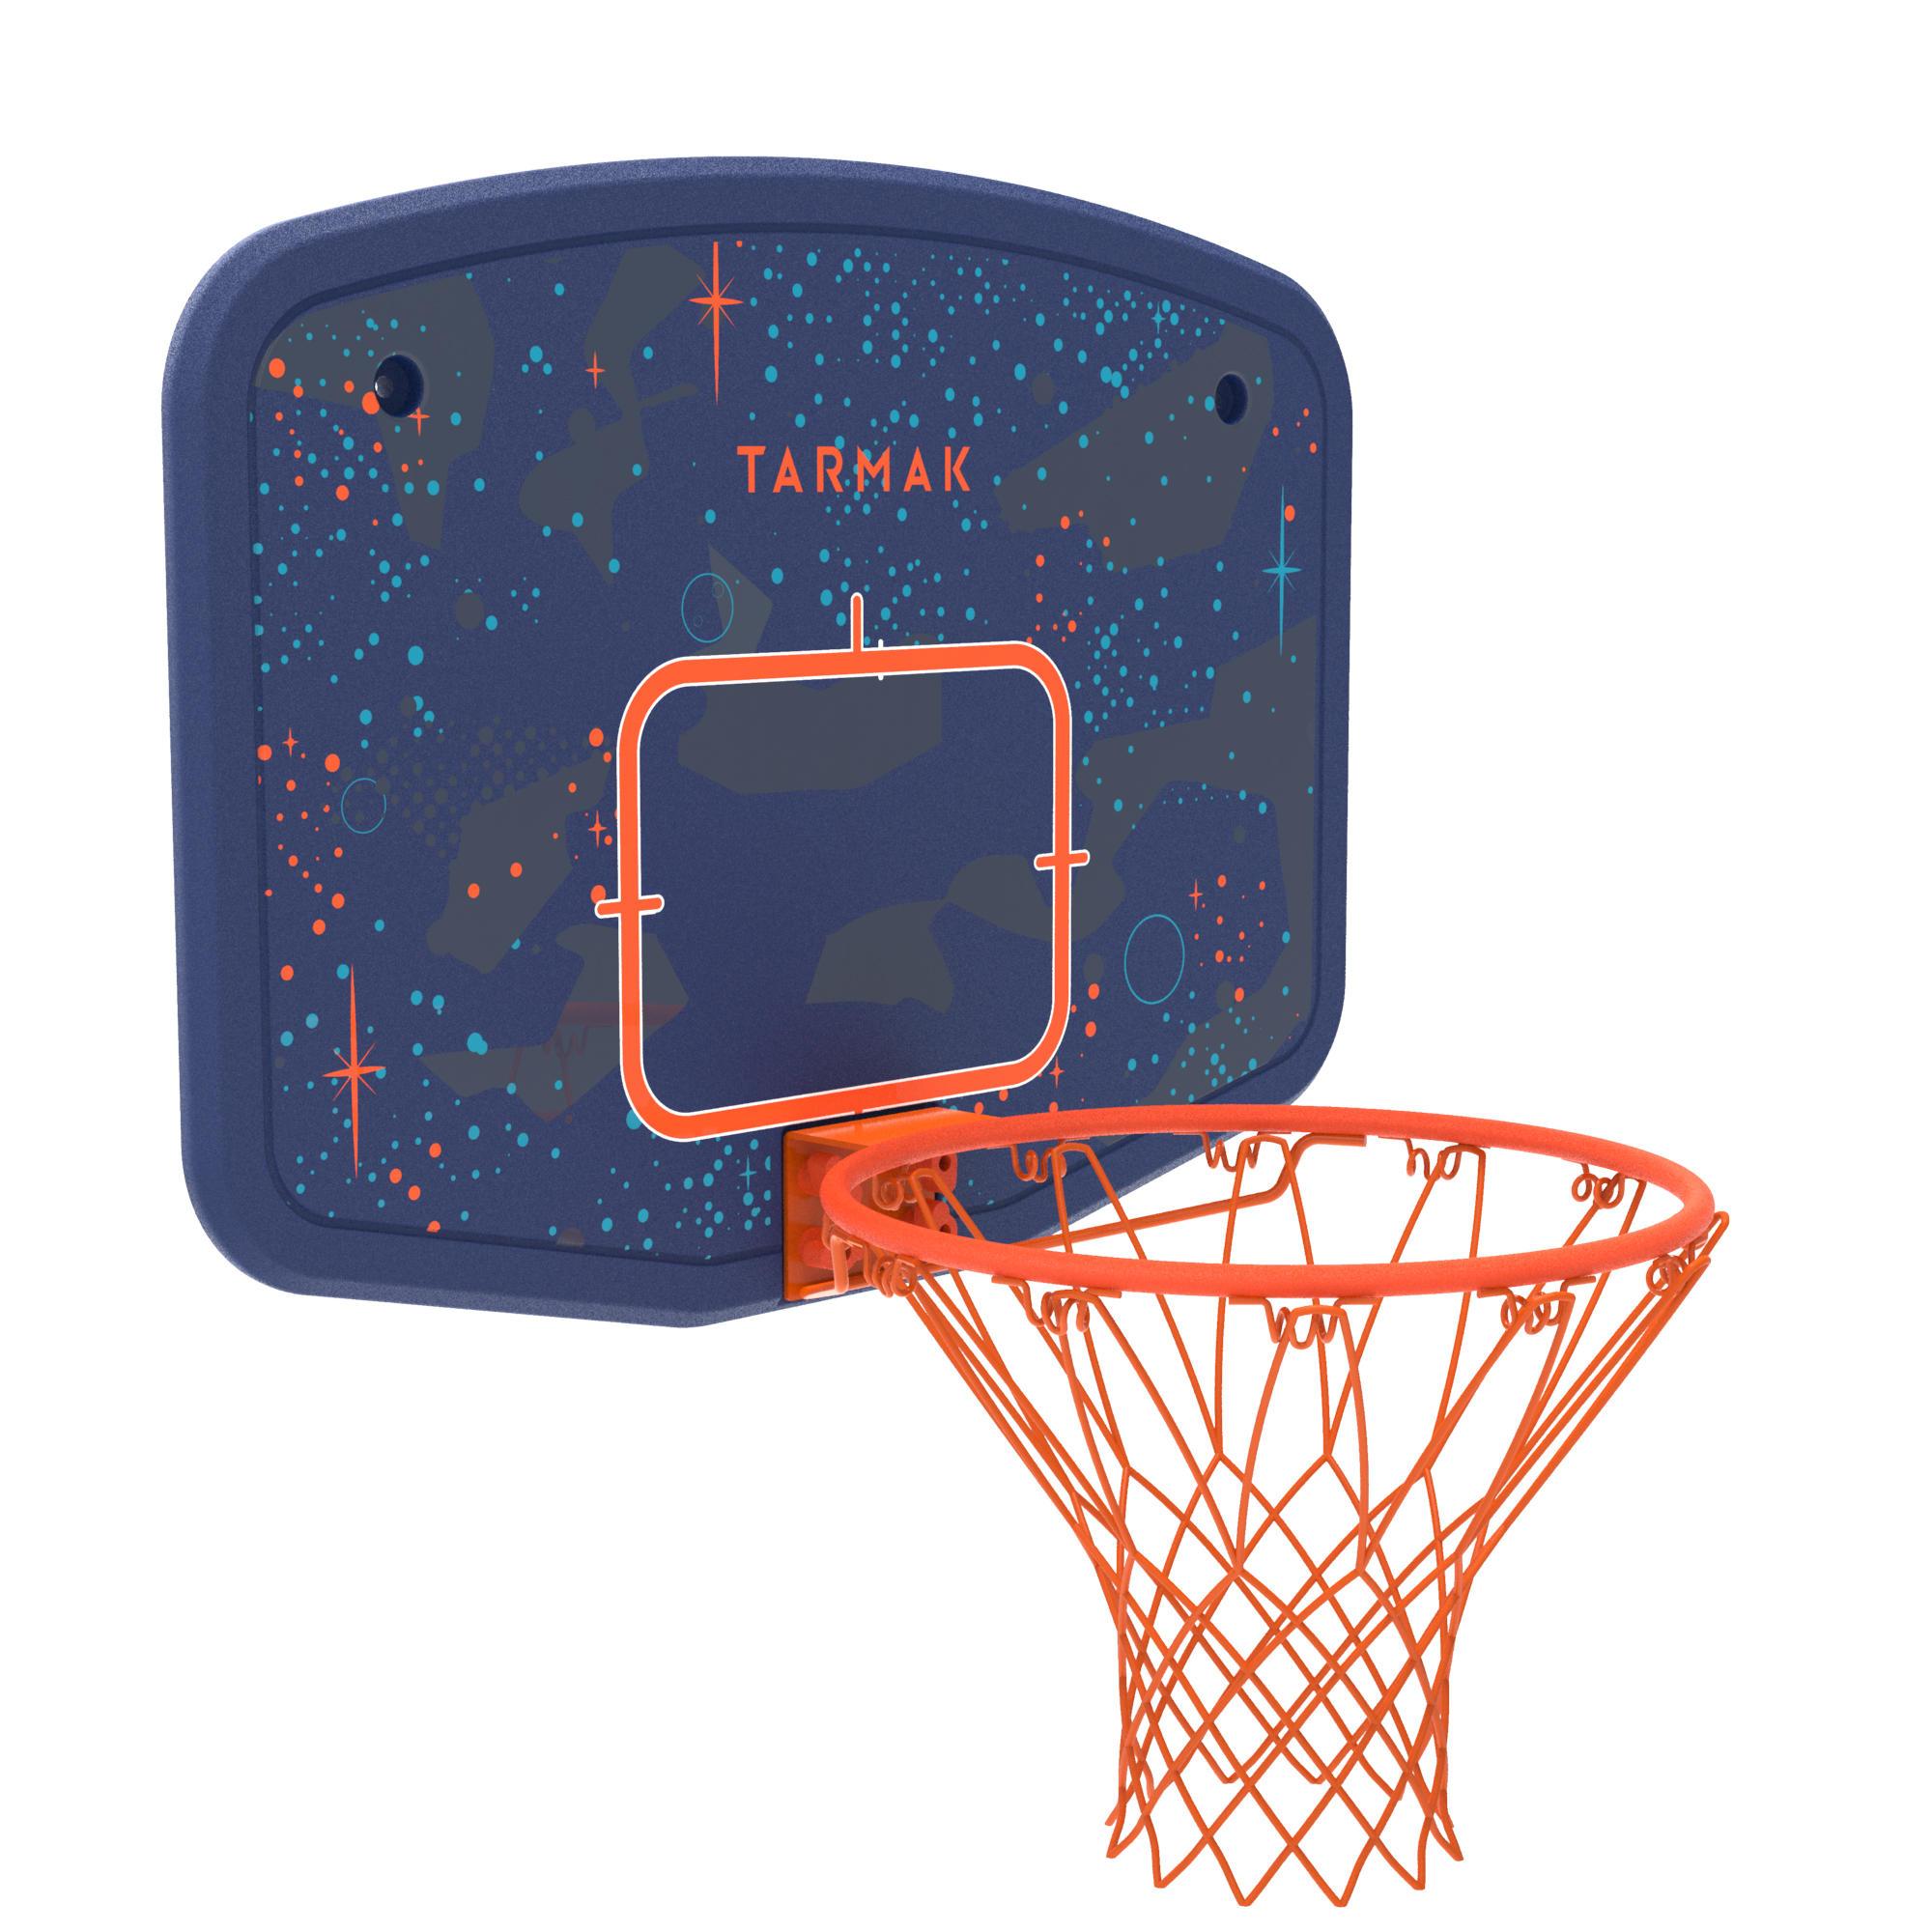 Tarmak Basketbalbord B200 Easy (tot 10 jaar)